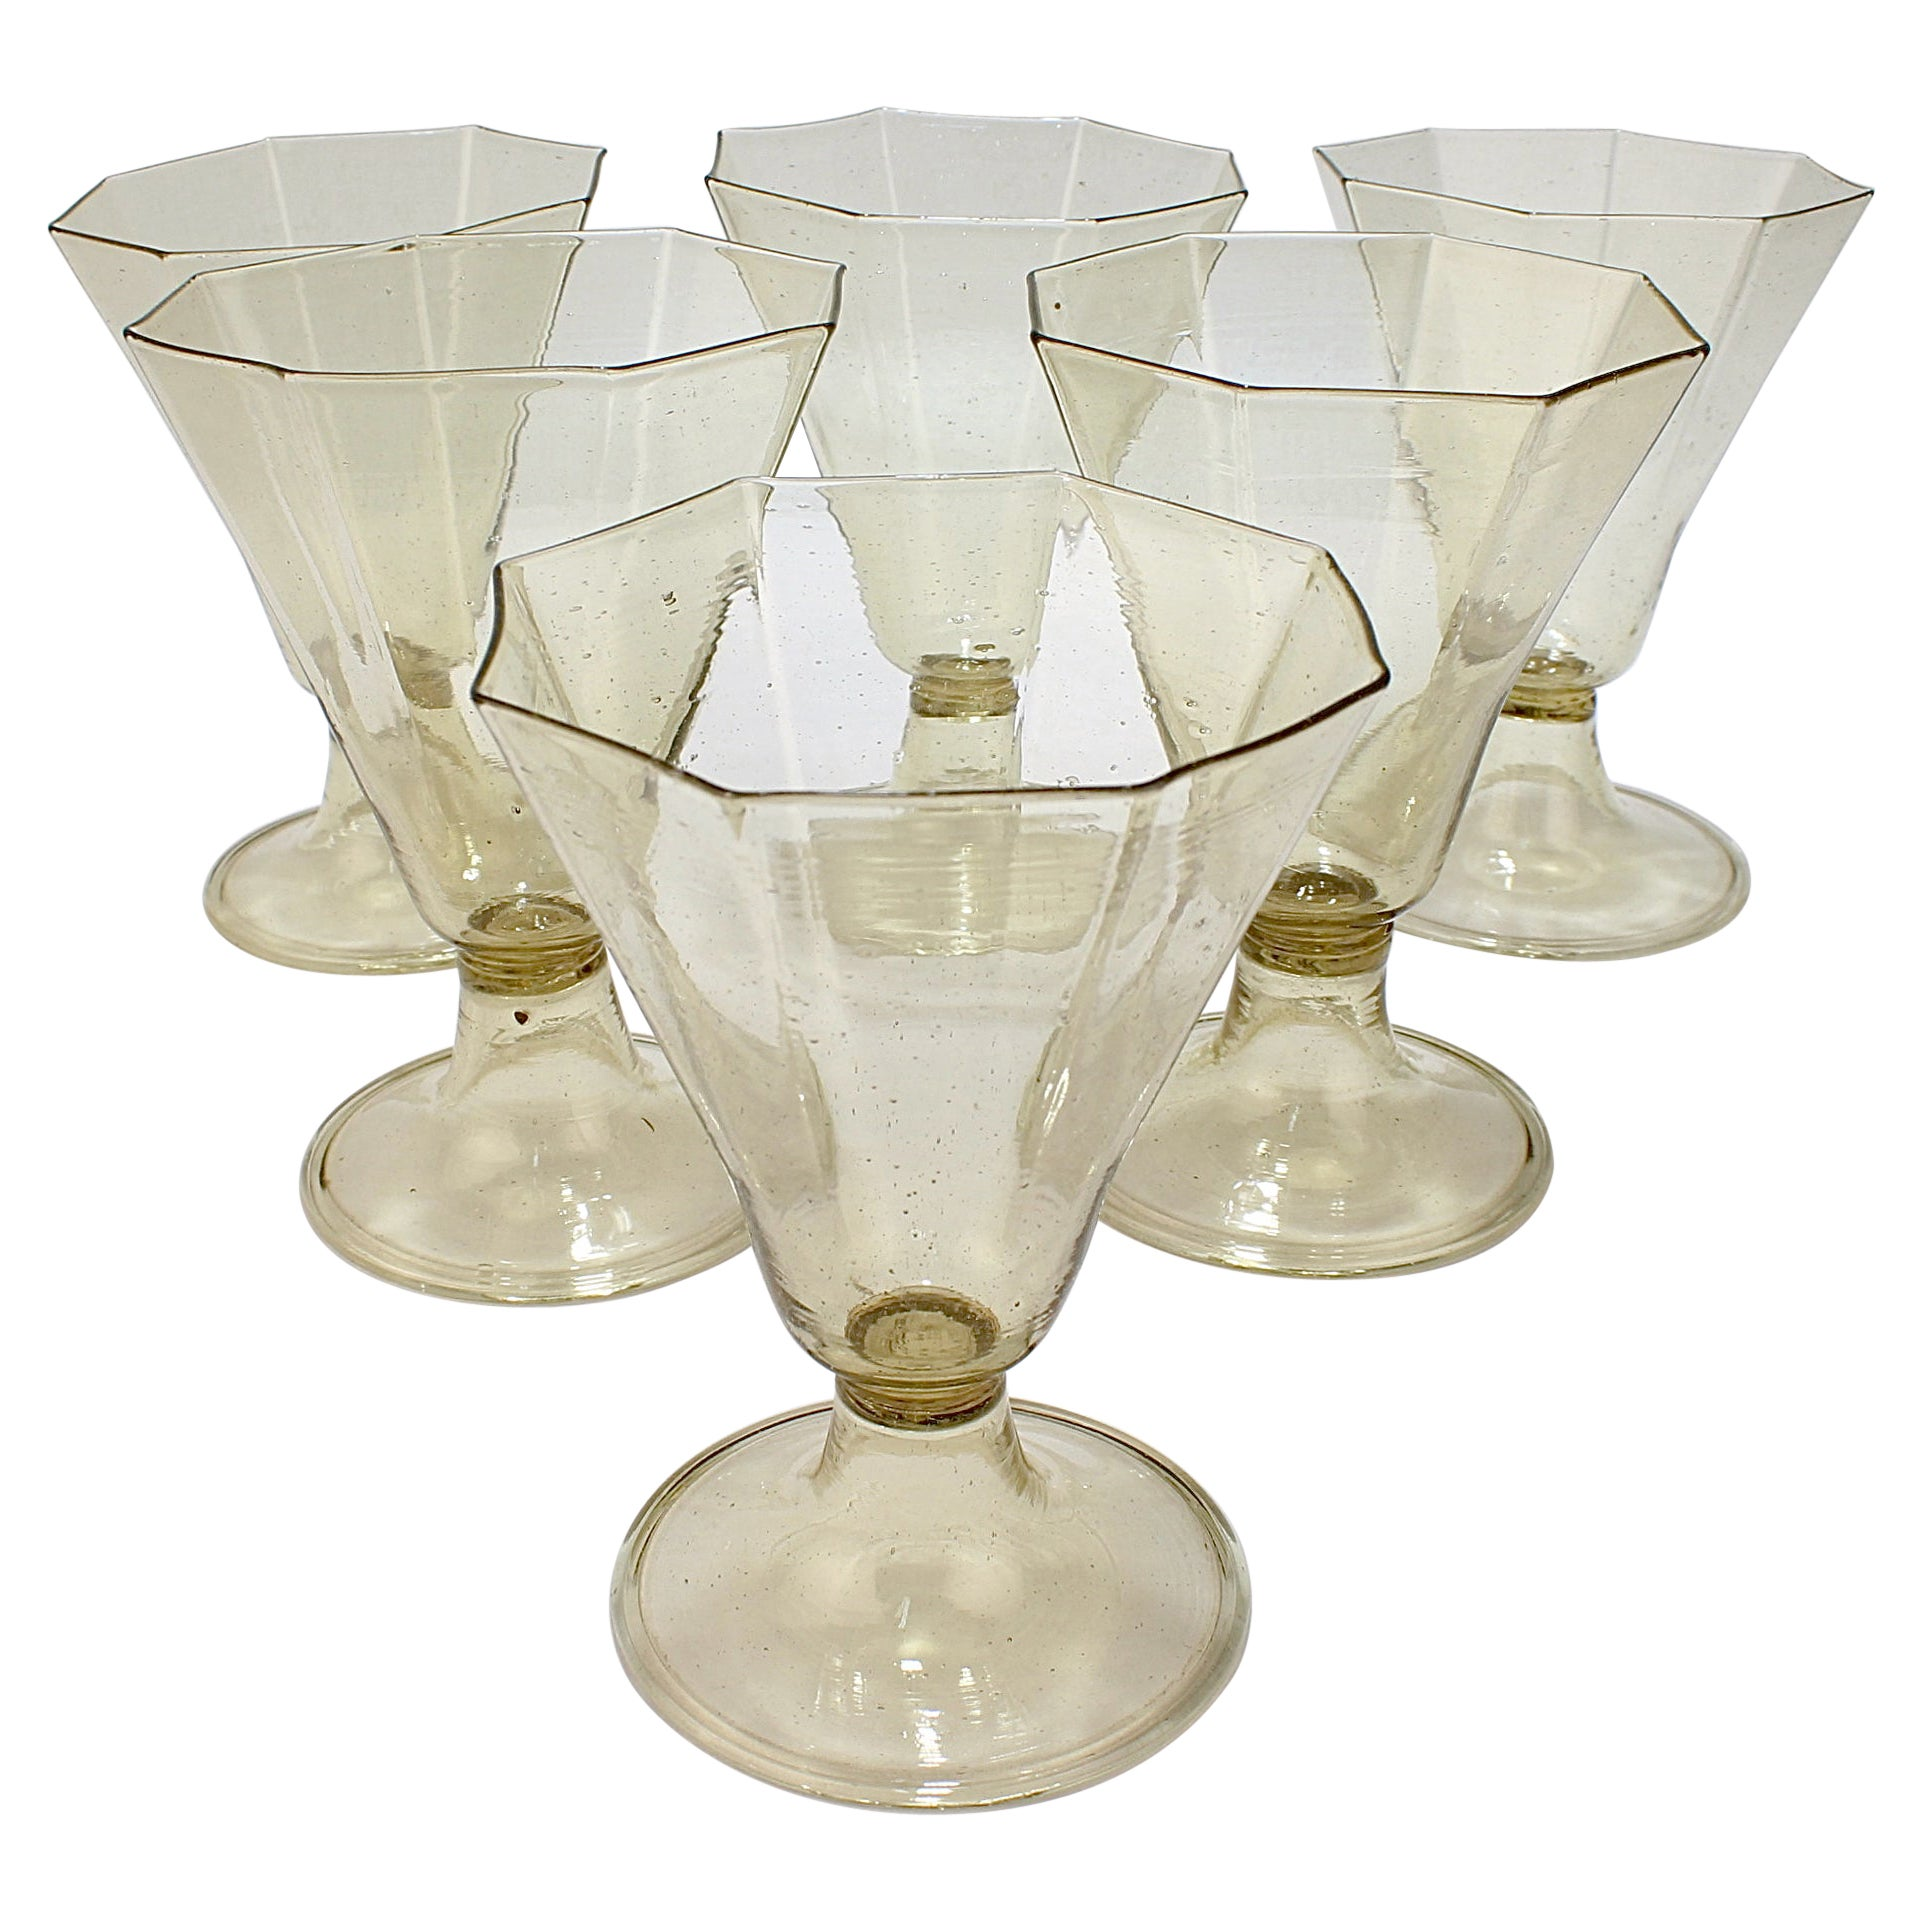 Set of 6 Vintage Venetian or Murano Amber Glass Wine Glasses